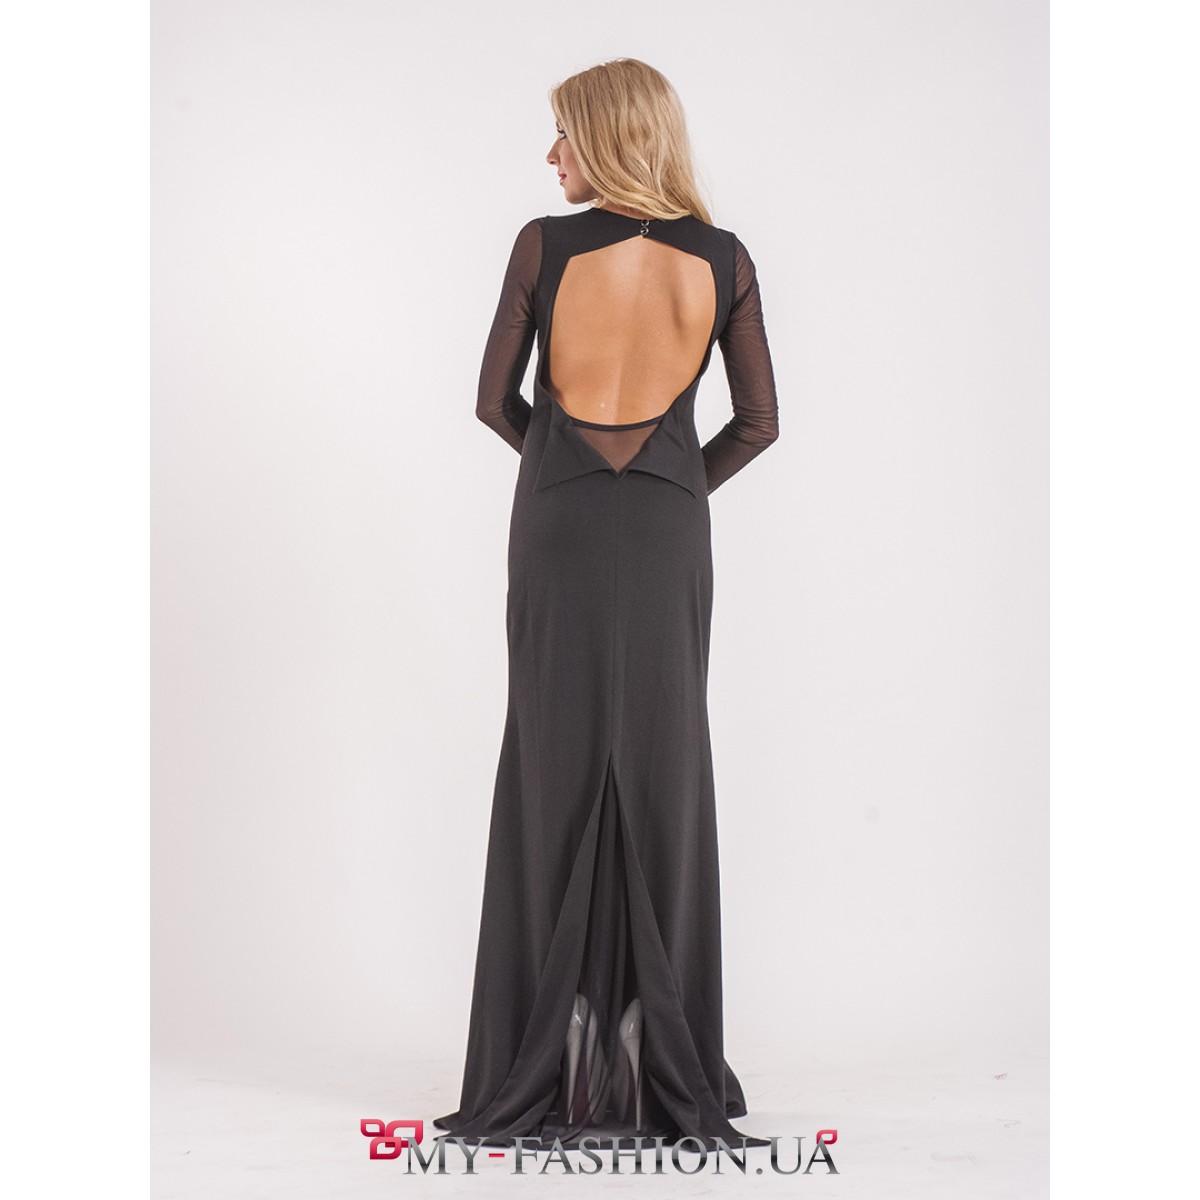 Платья онлайн доставка